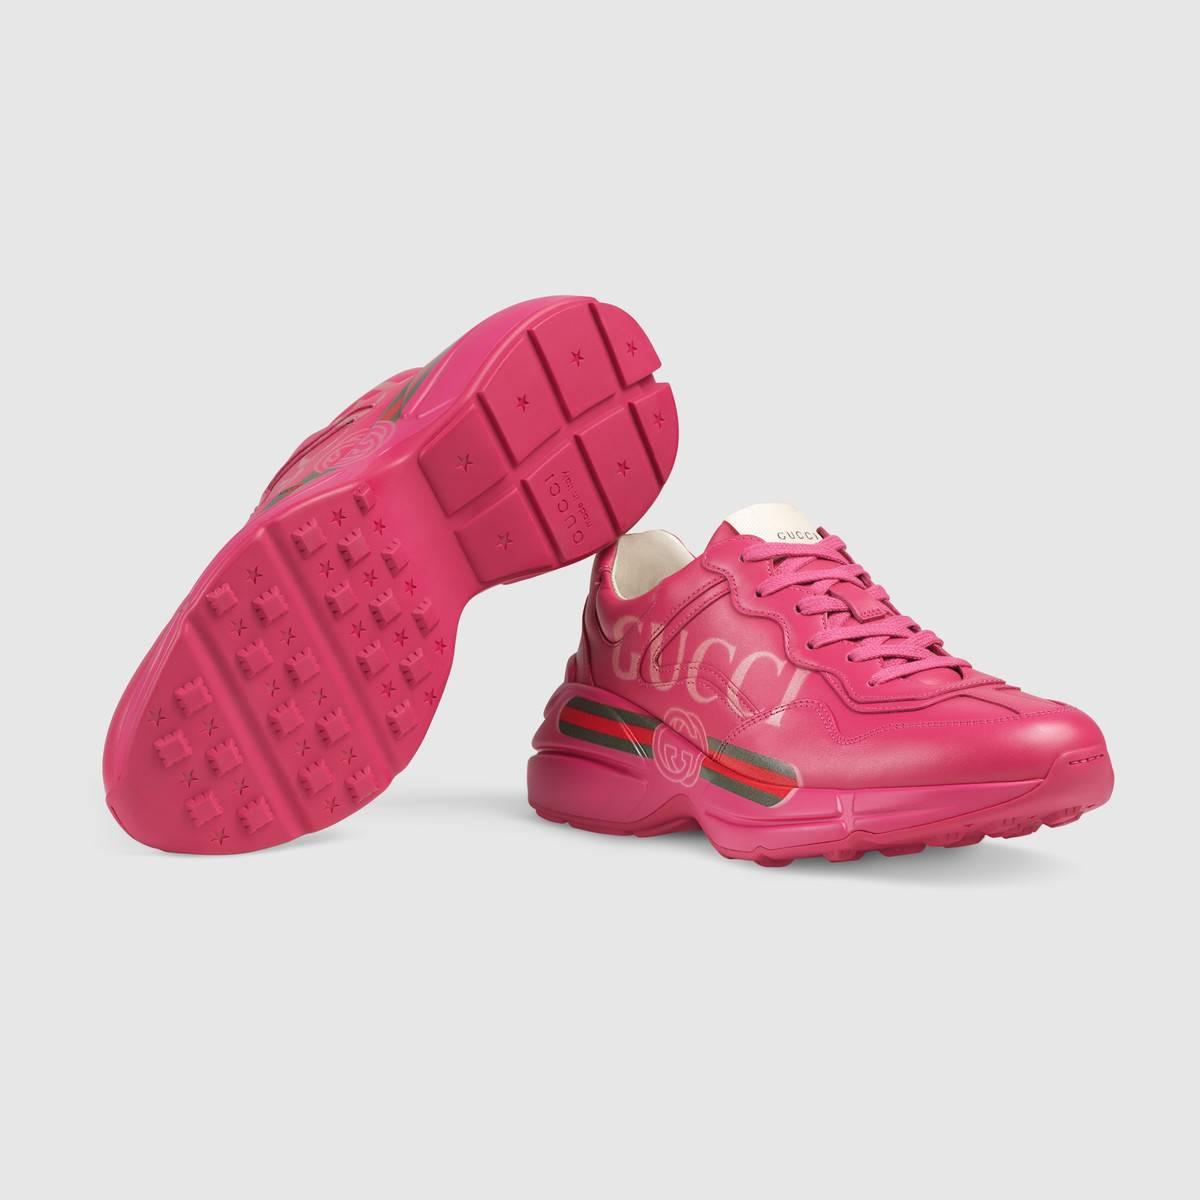 528892_DRW00_5752_006_100_0000_Light-Rhyton-Gucci-logo-leather-sneaker